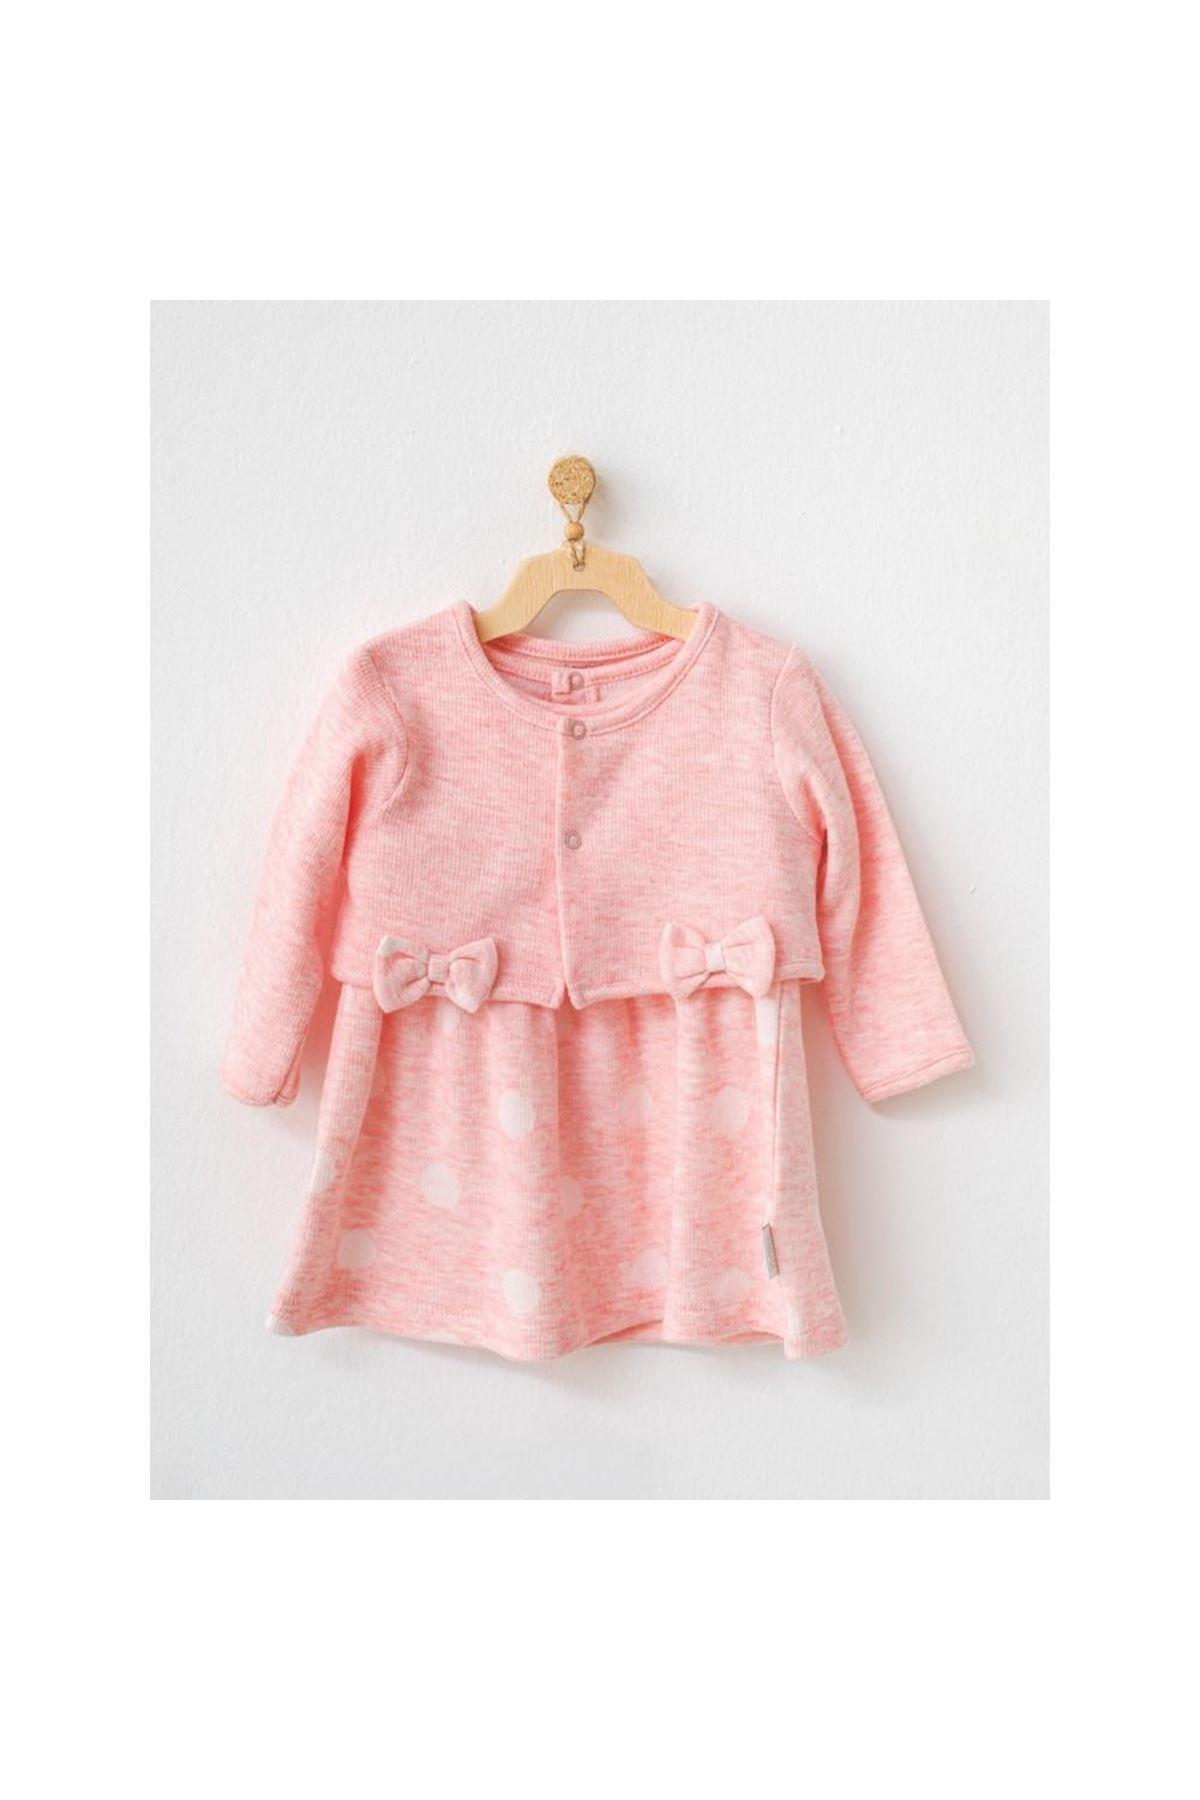 Andywawa AC21136 Polka Dot Bolero Elbise Set Pink